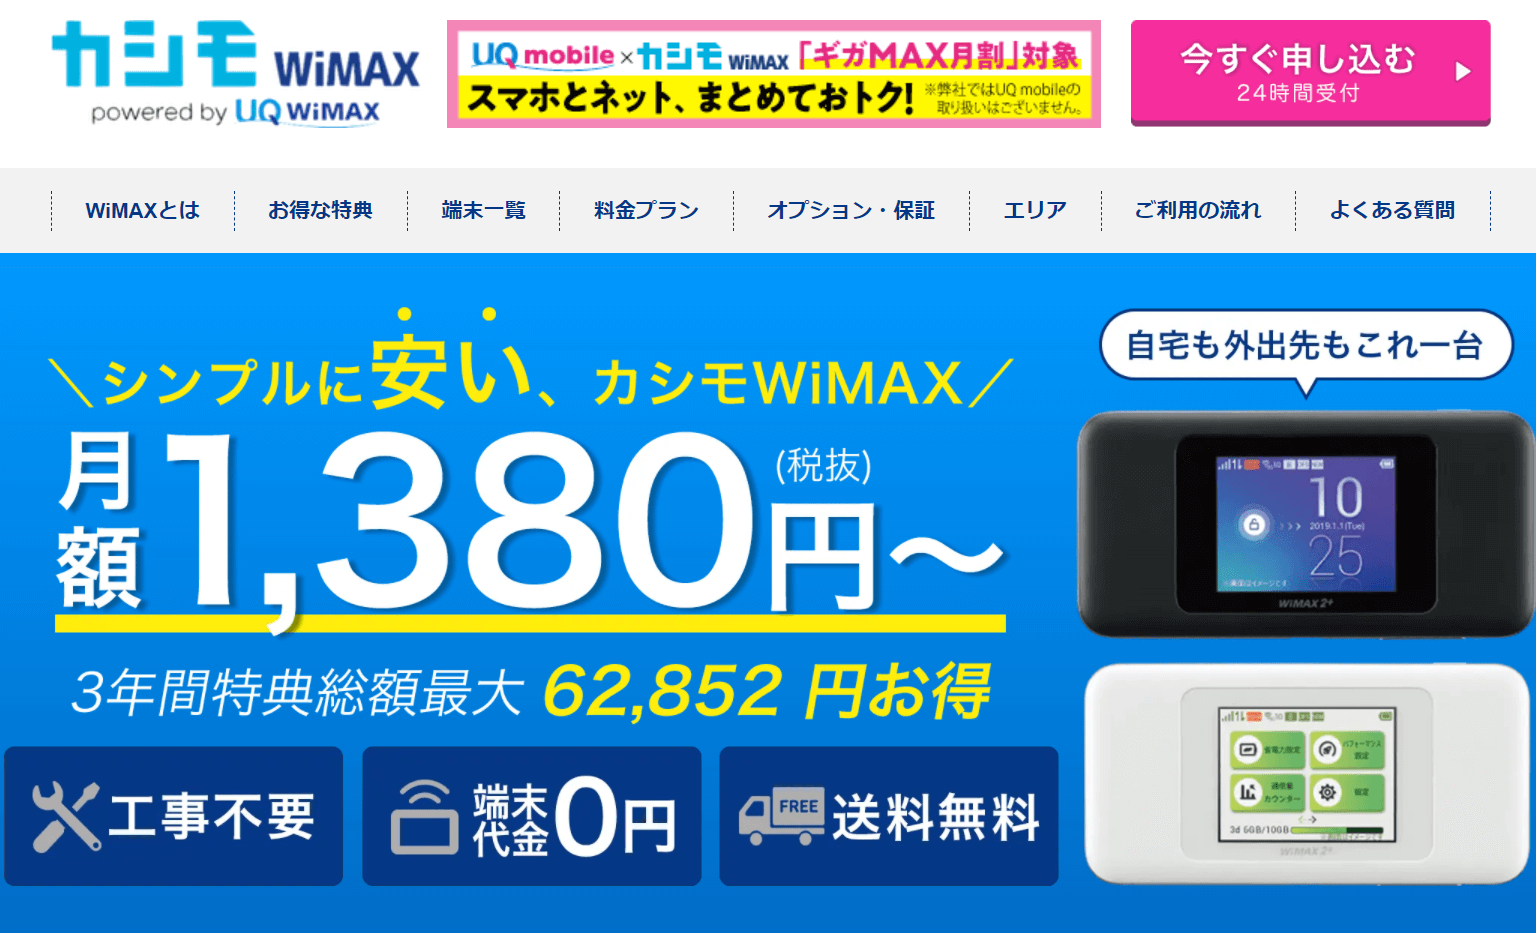 WiMAX_キャンペーン_比較_カシモロゴ